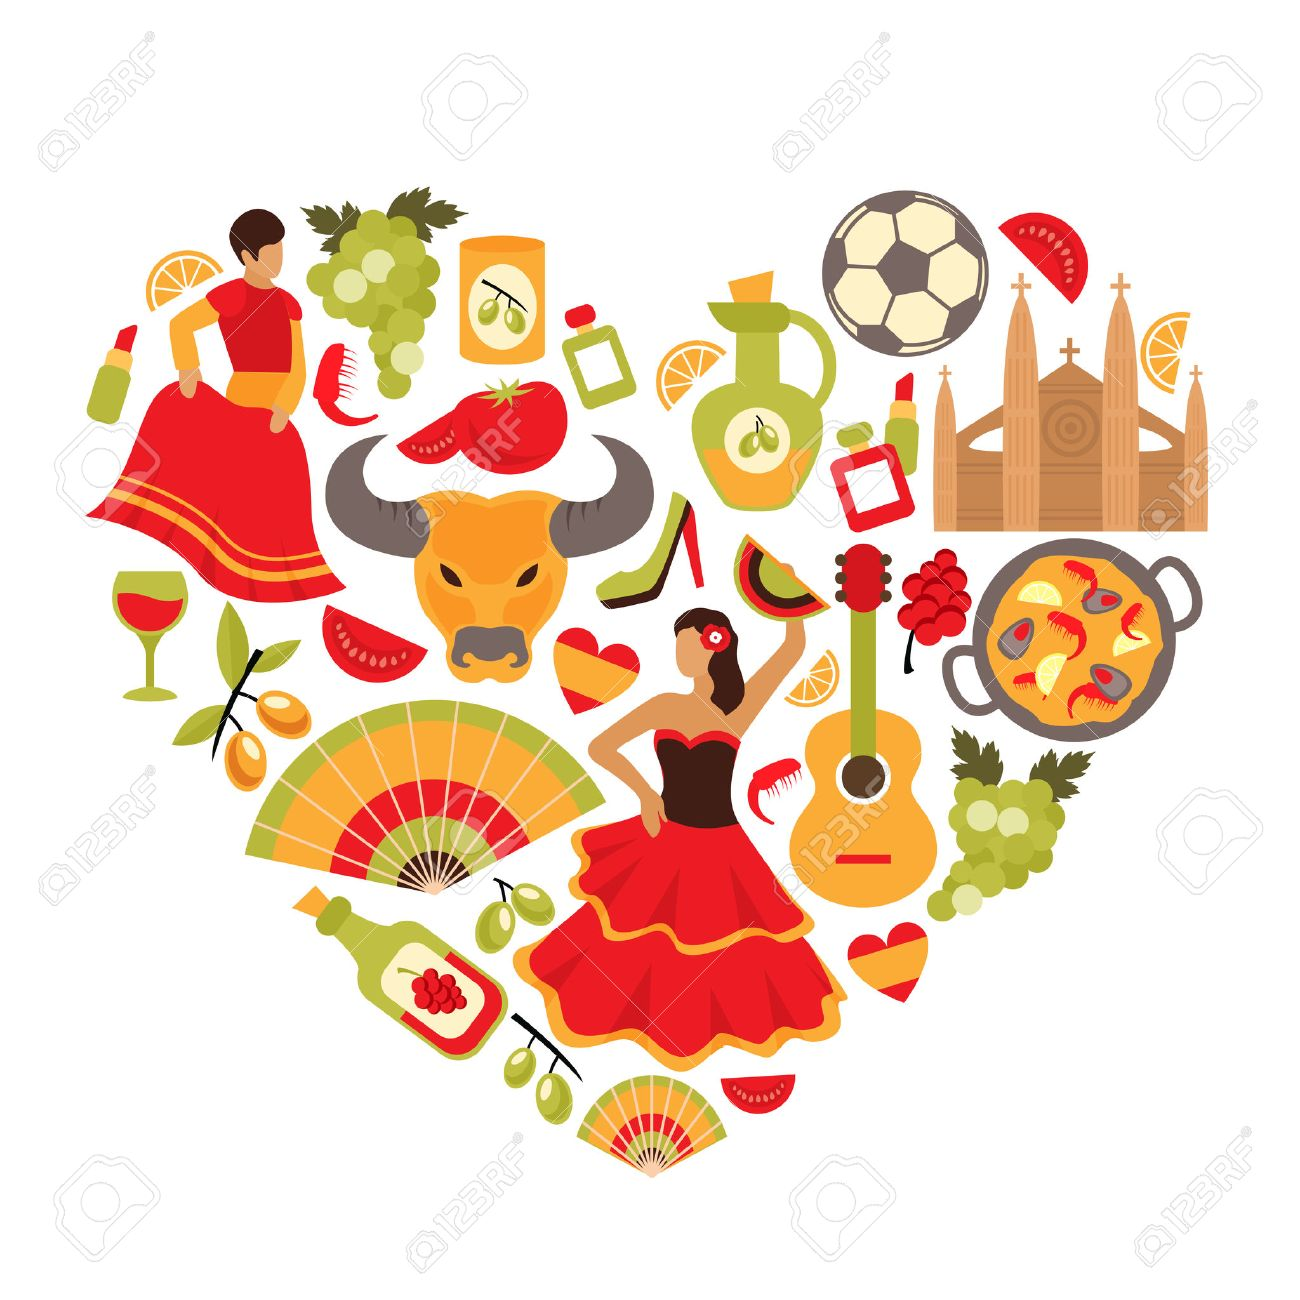 Decorative Spain Cultural Traditions Flamenco Dance Food Grape